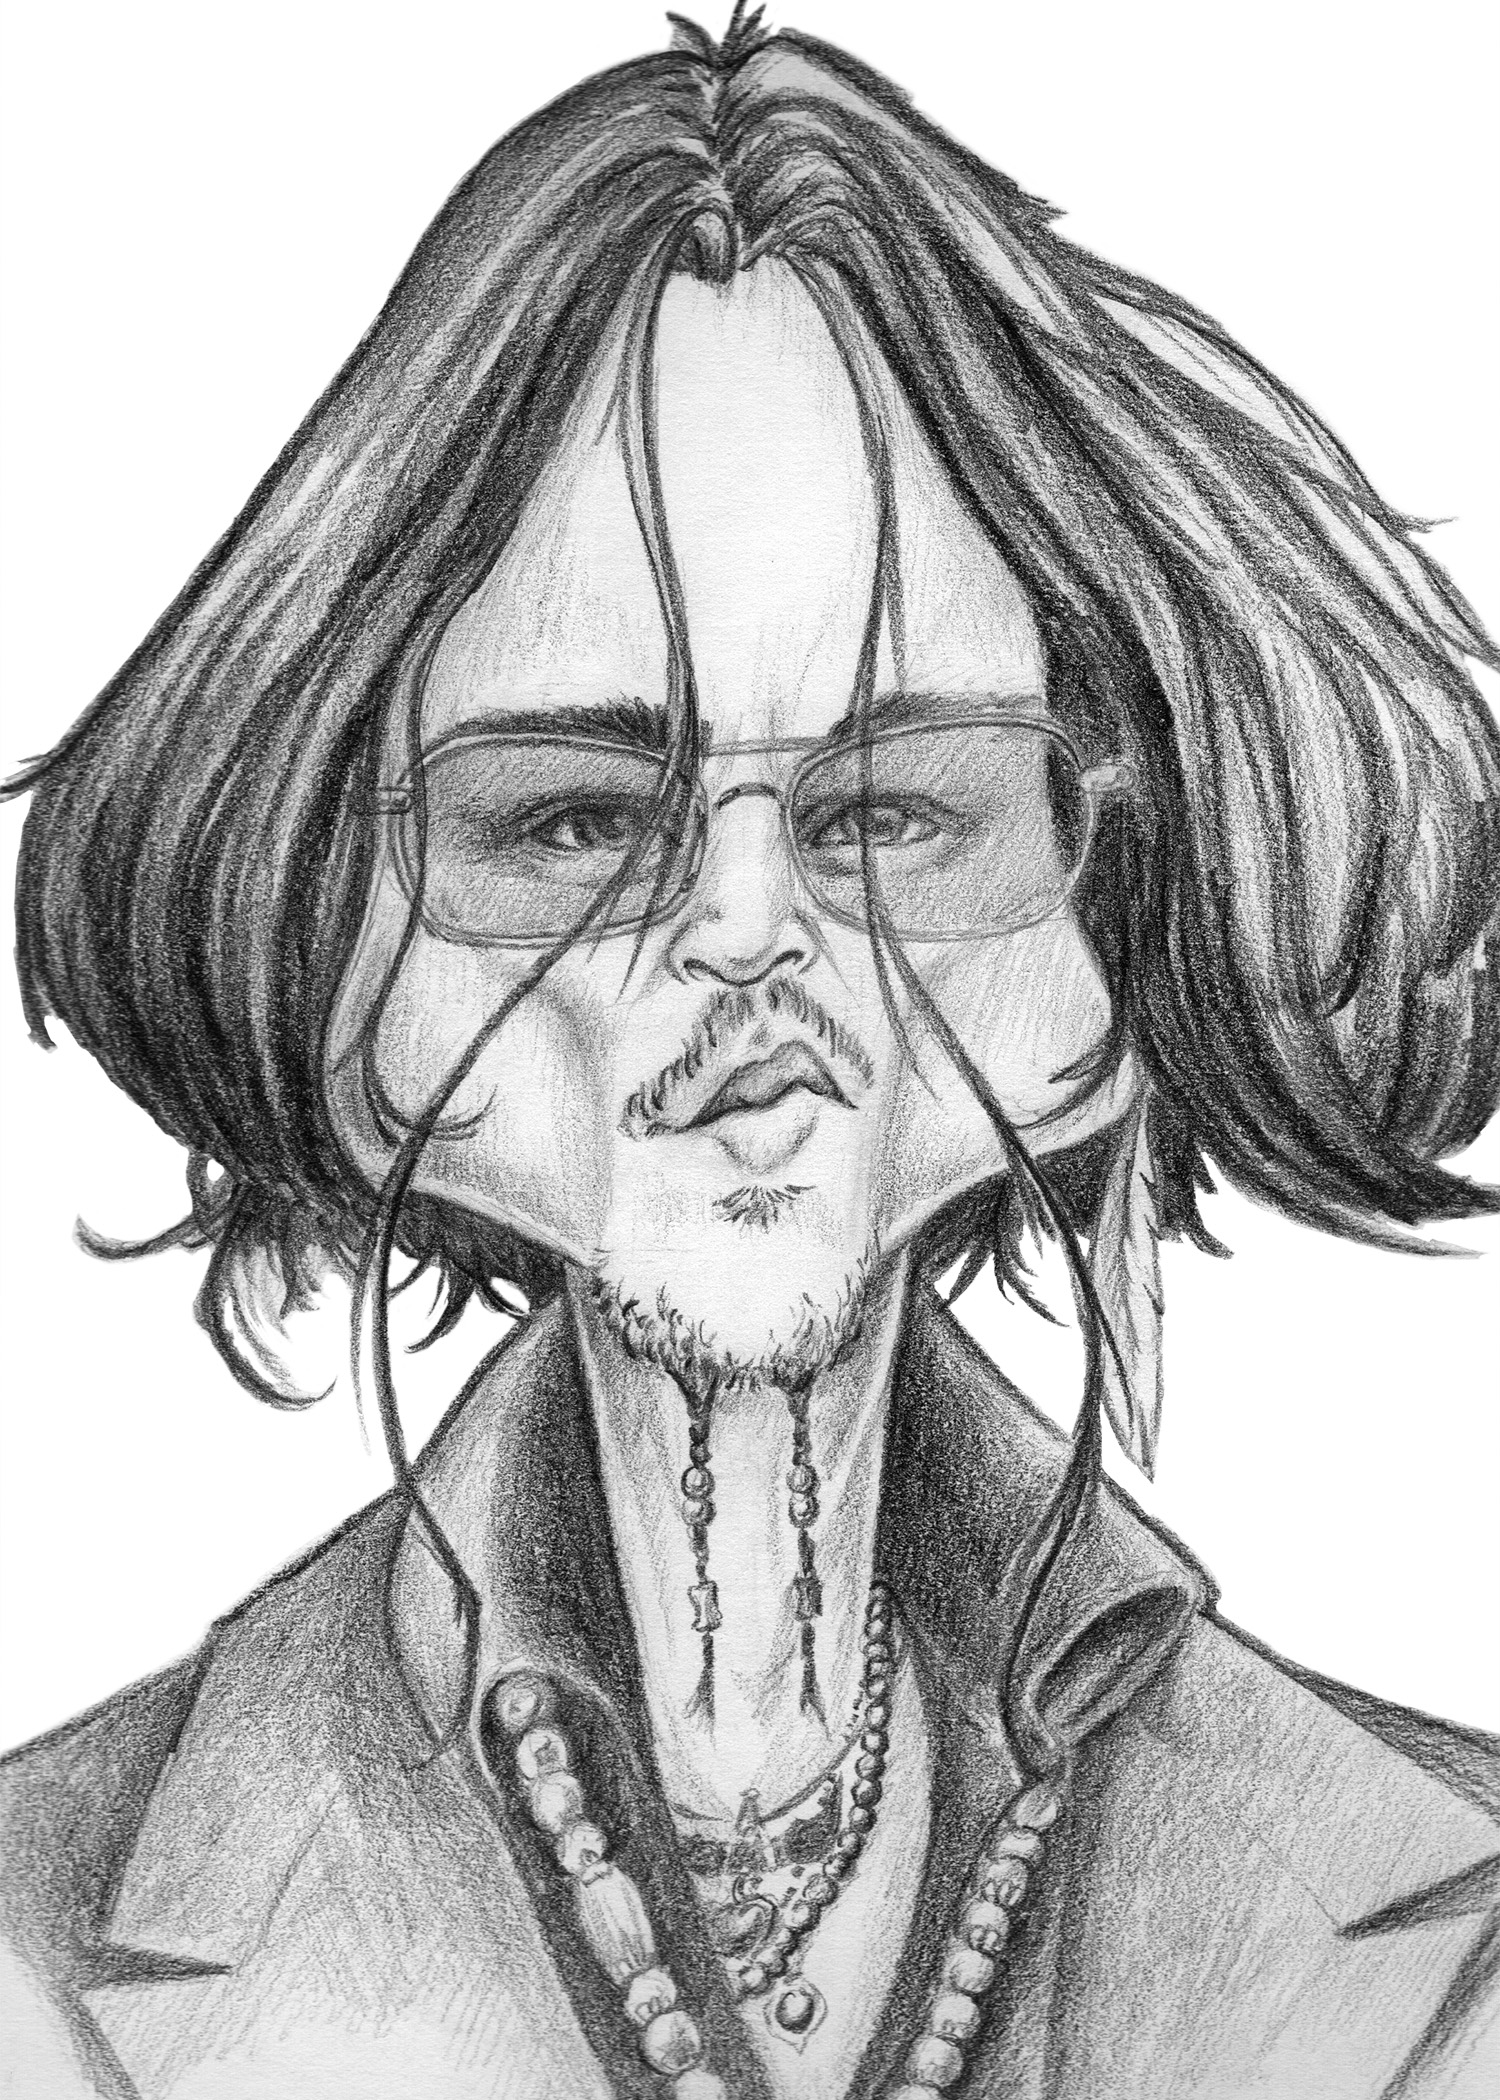 Caricature of Johnny Depp